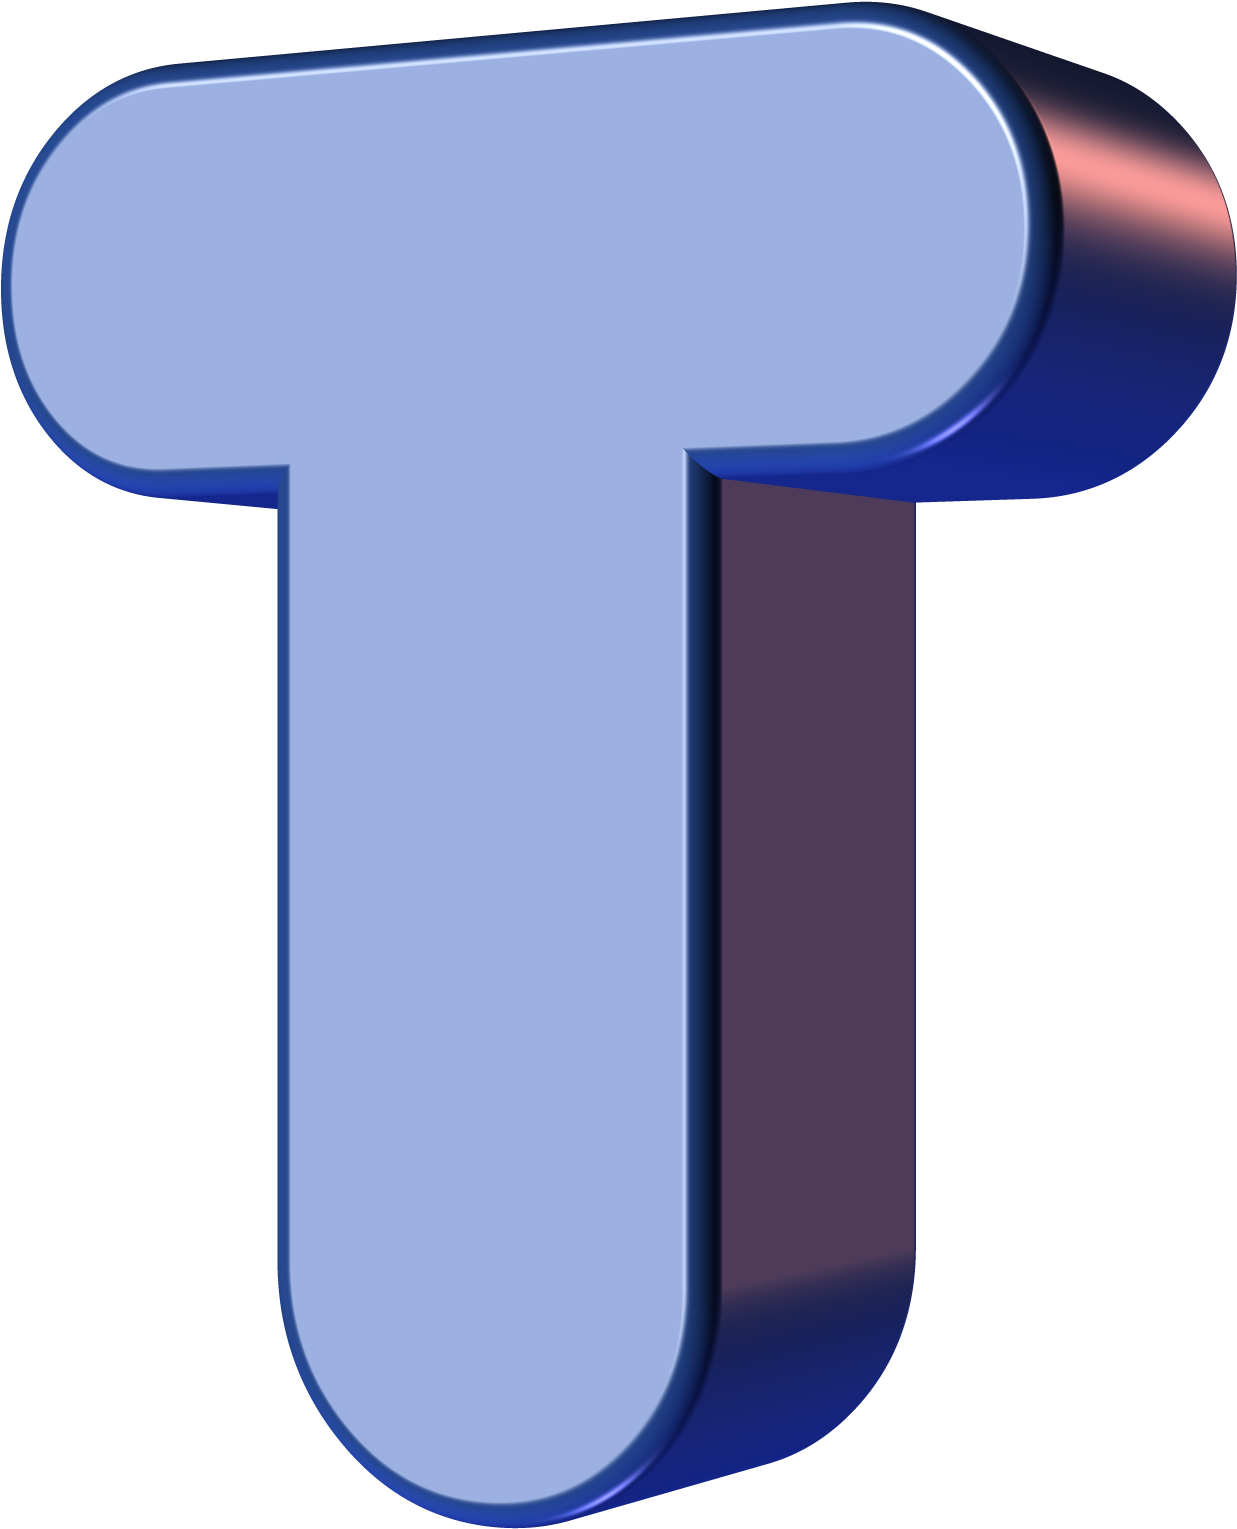 Alphabet Character Letter Abc 1186431 Clipart.